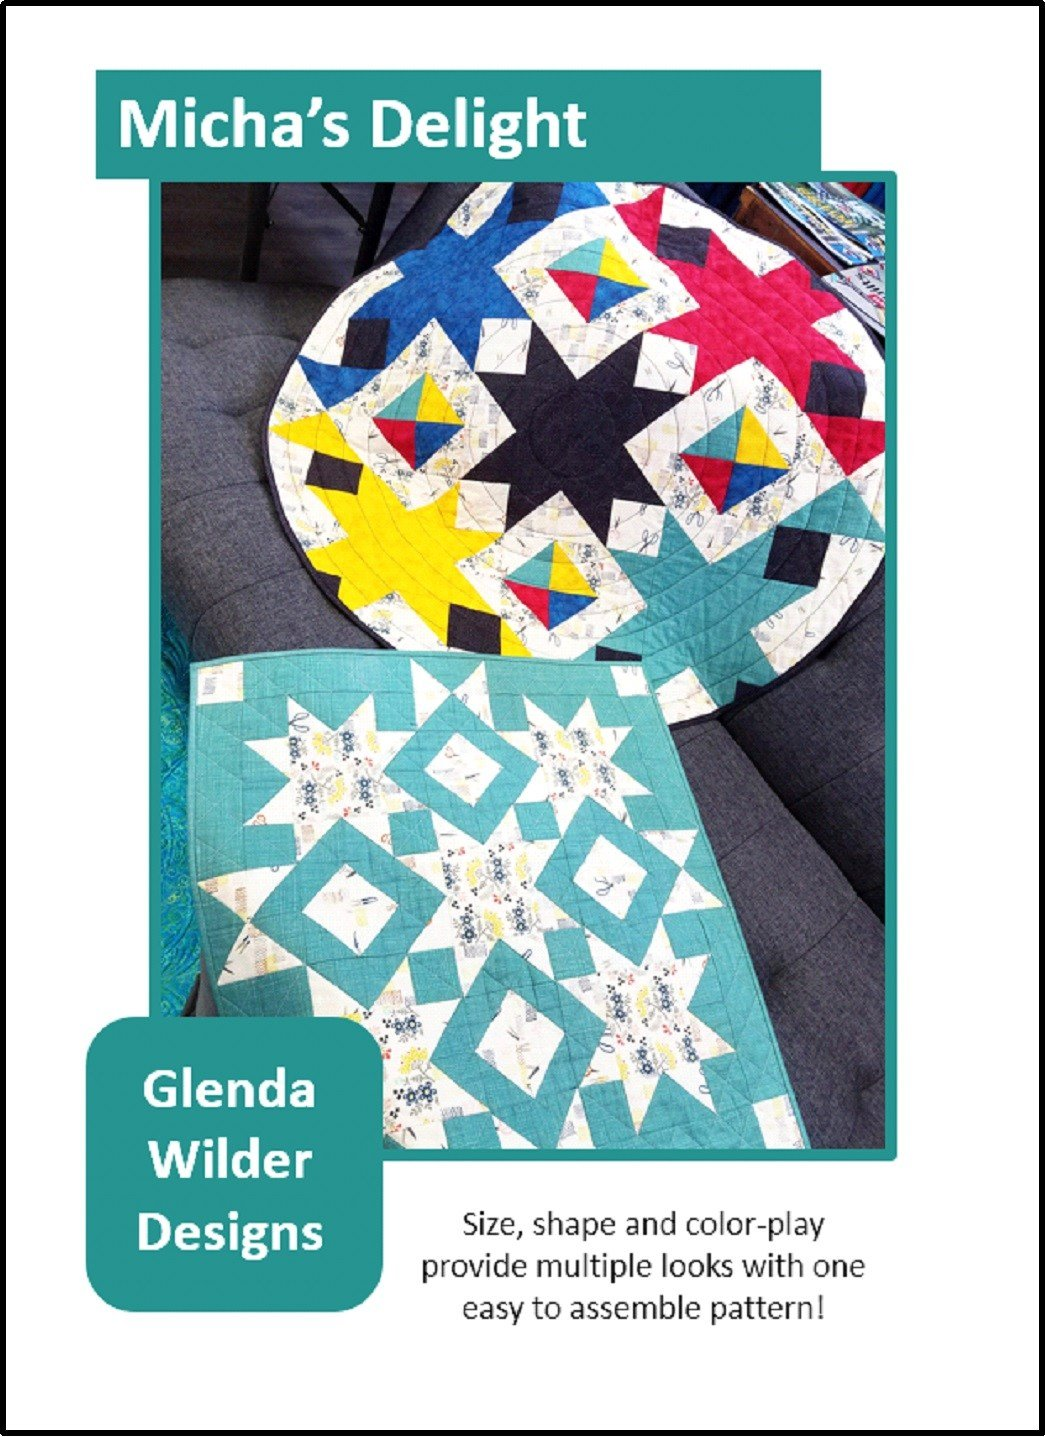 Glenda WIlder Designs - Micha's Delight